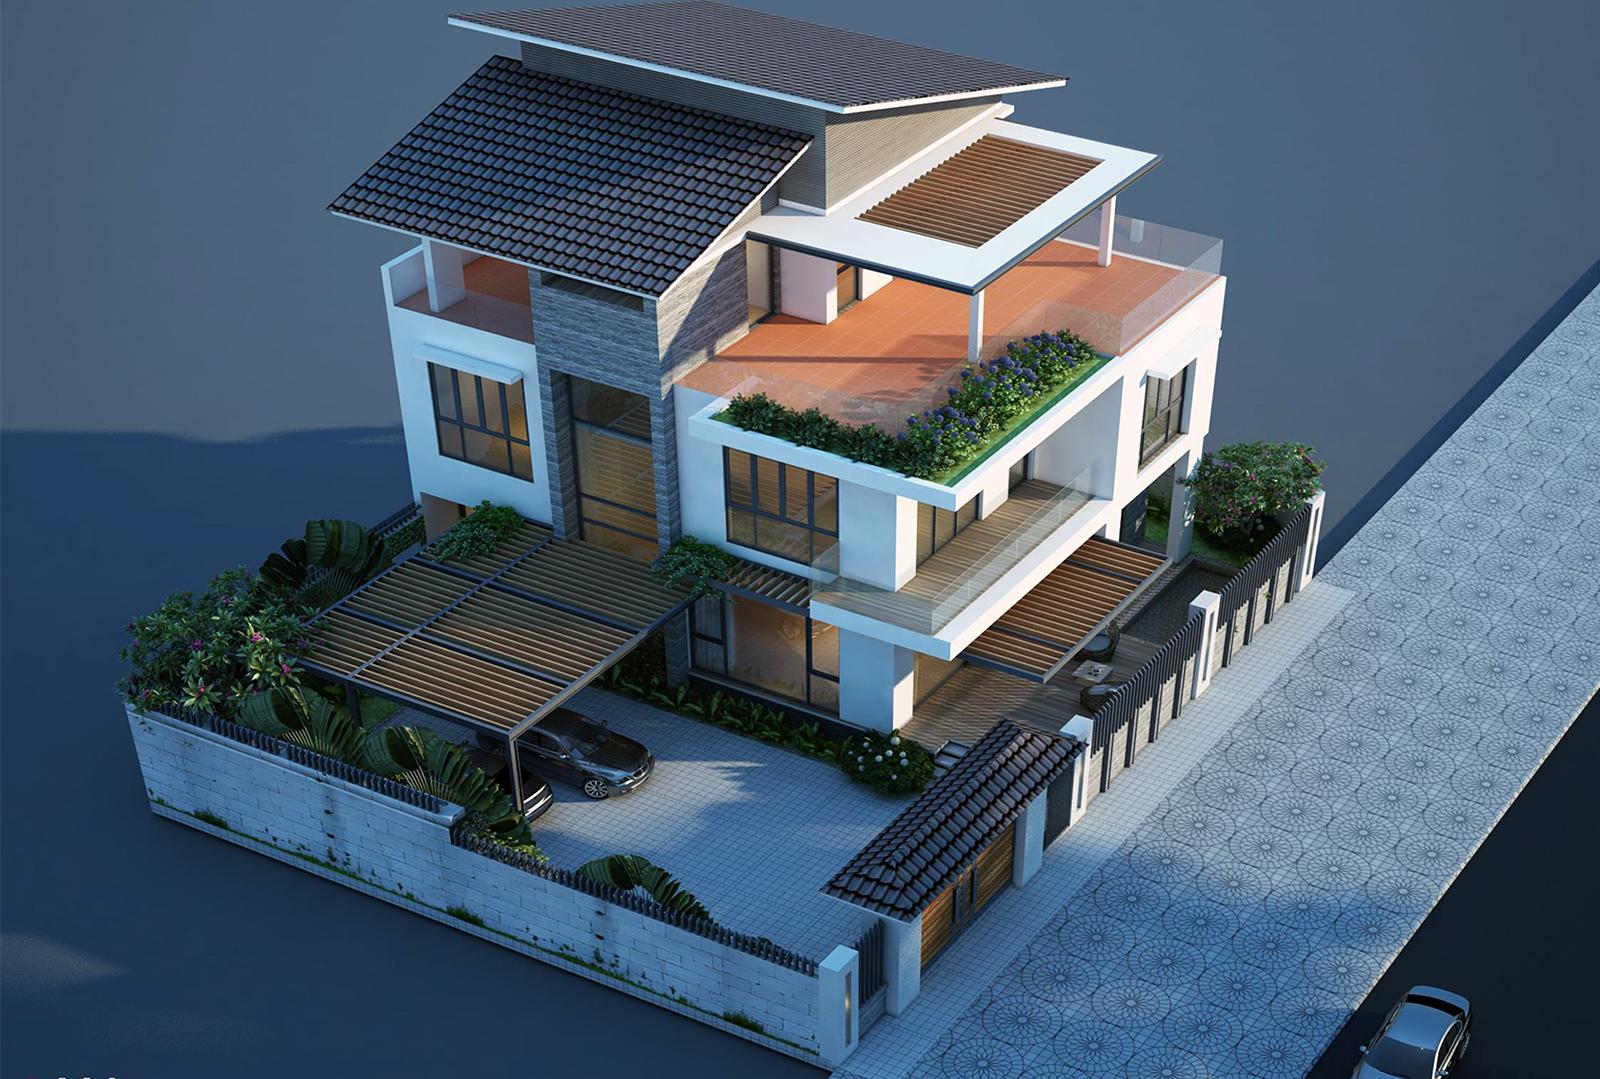 MR TUAN HOUSE